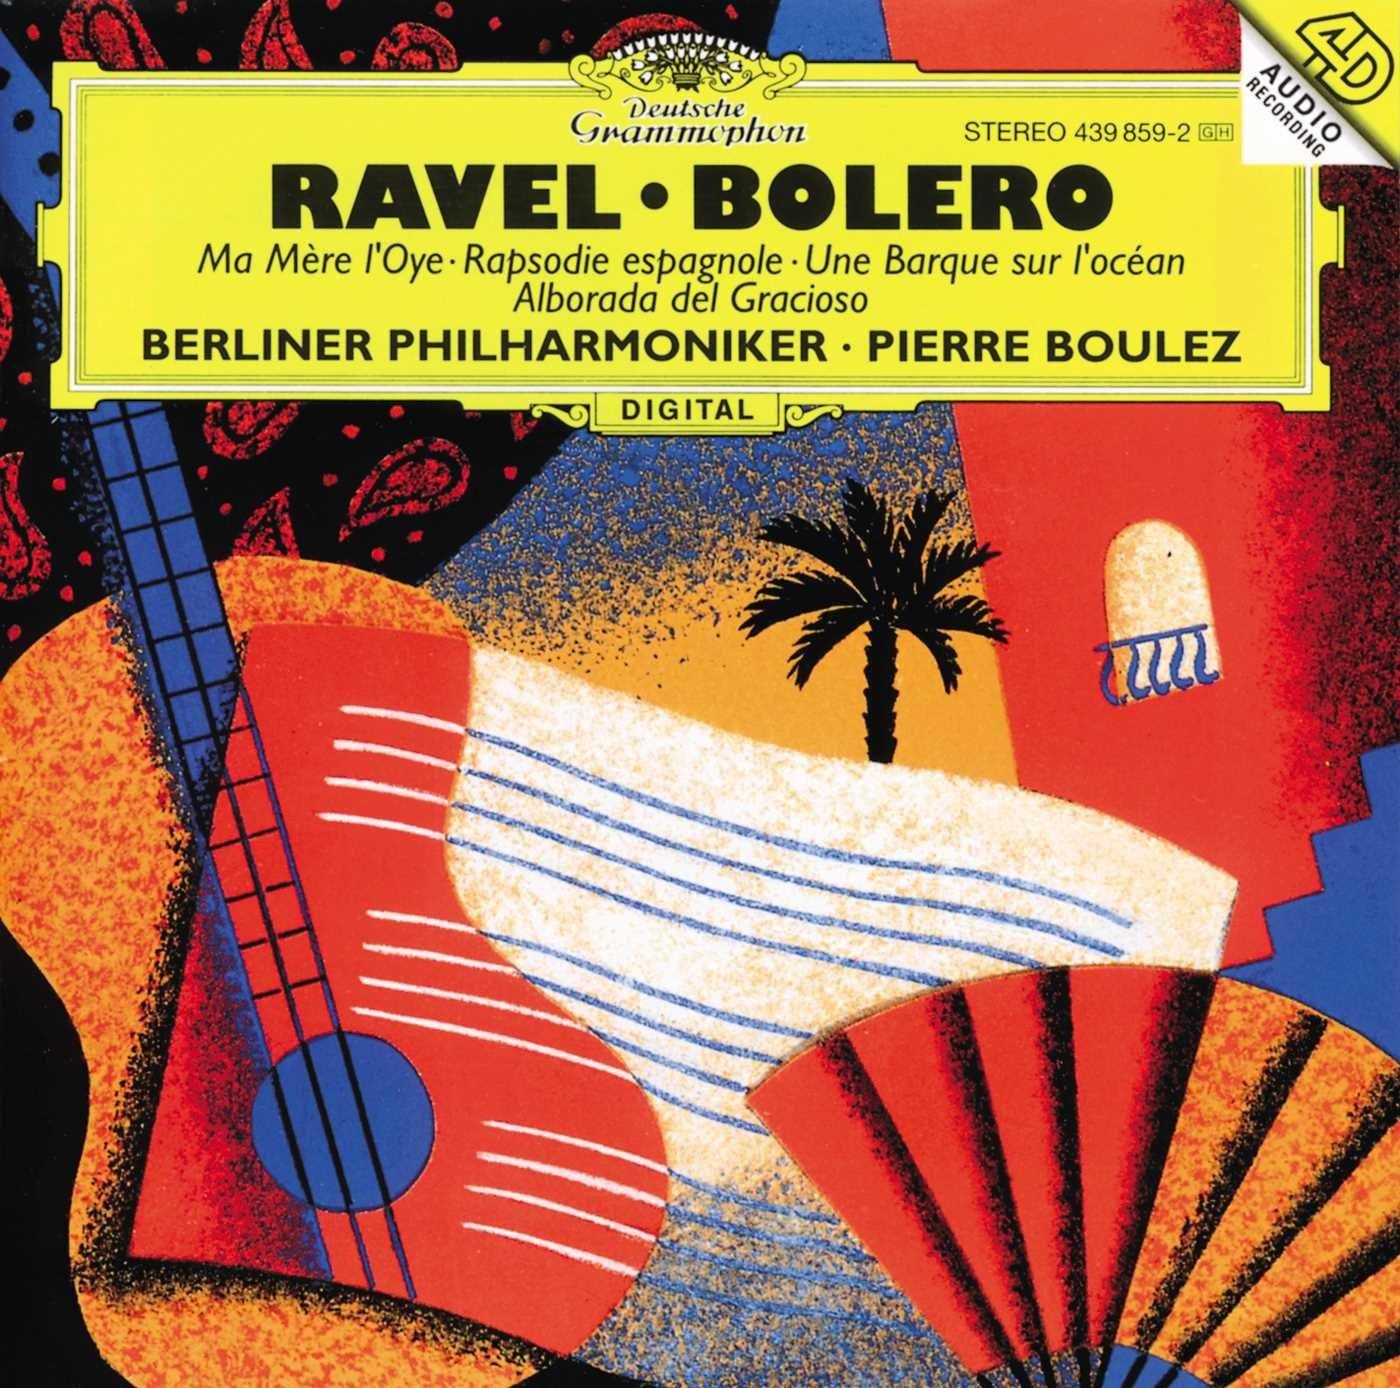 Ravel: Bolero / Ma Mere L'Oye / Rapsodie Espagnole